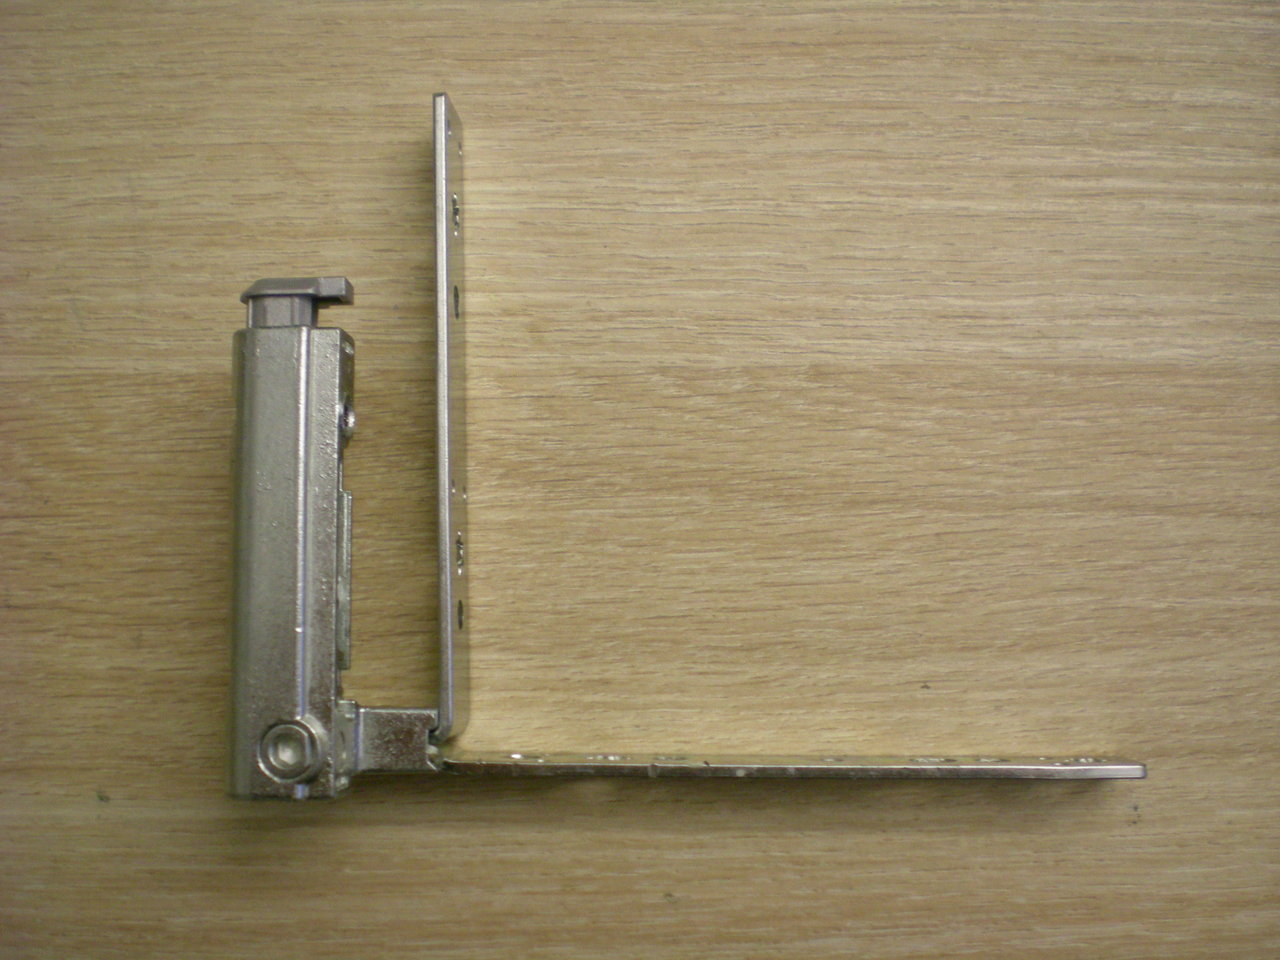 maco falzeckband holz 4 15 9 f r 34mm topfecklager links febes fensterbeschlagservice. Black Bedroom Furniture Sets. Home Design Ideas